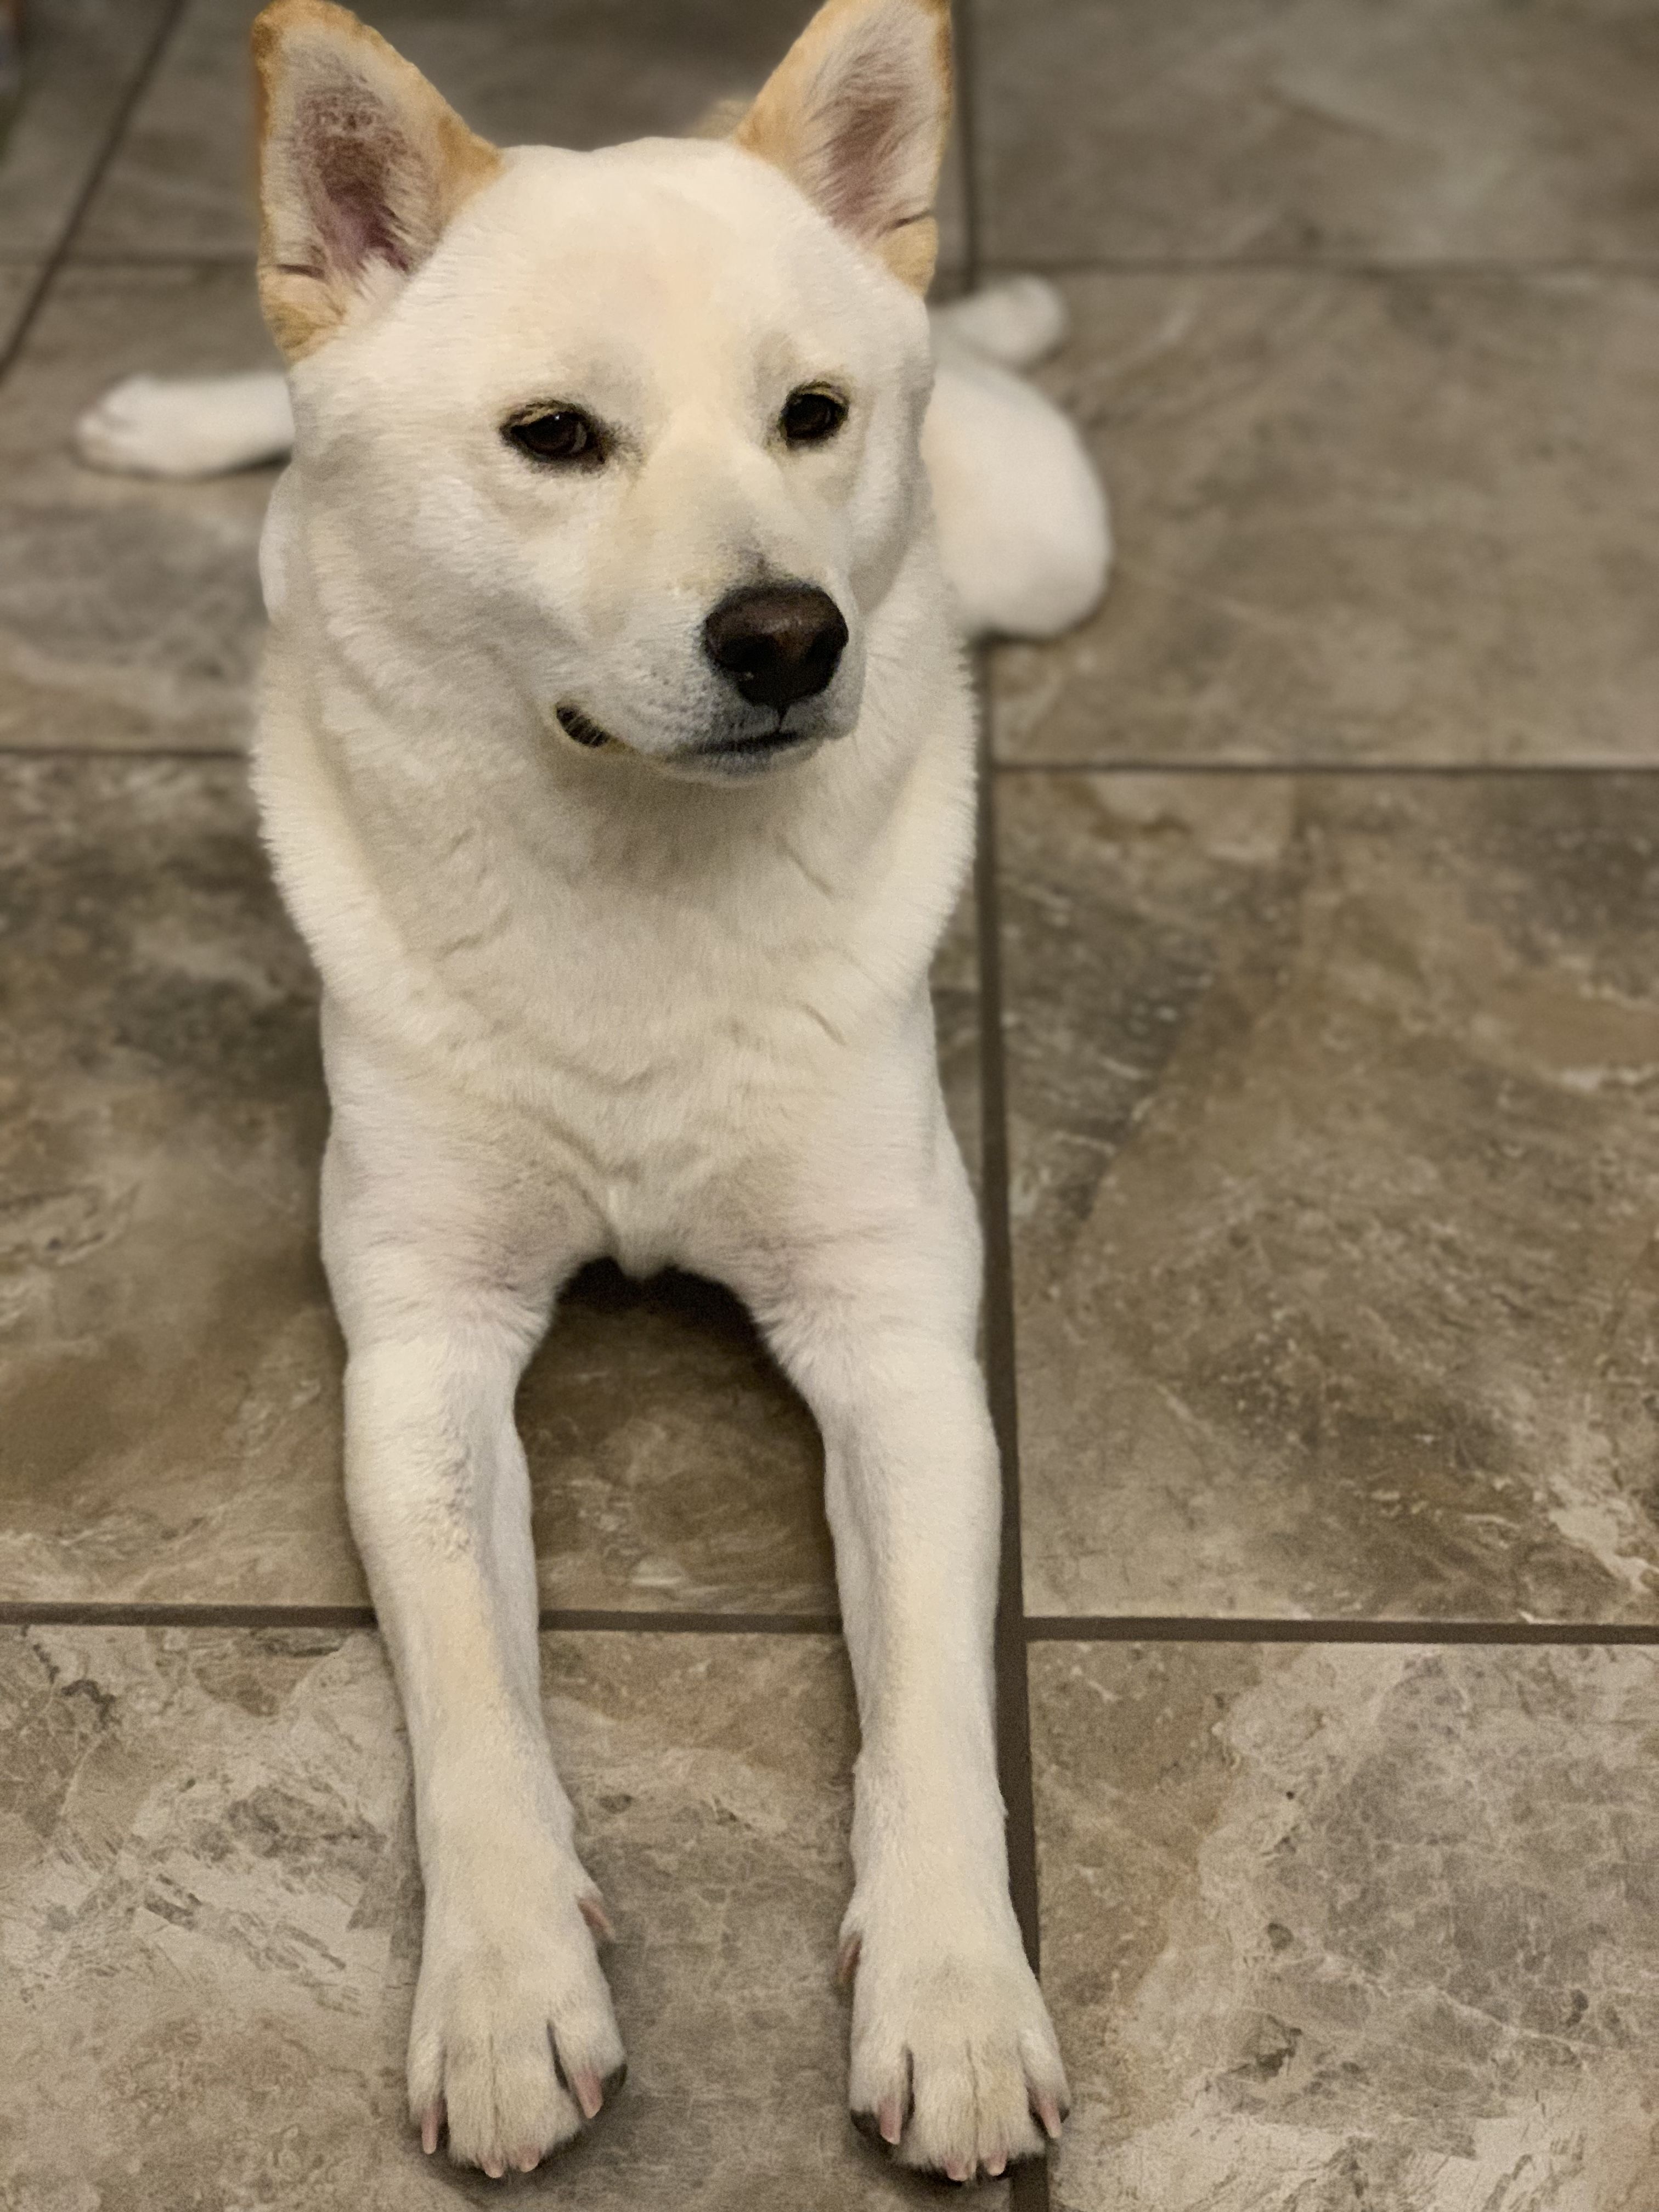 Shibainu Creamshiba With Images Shiba Inu Shiba Labrador Retriever